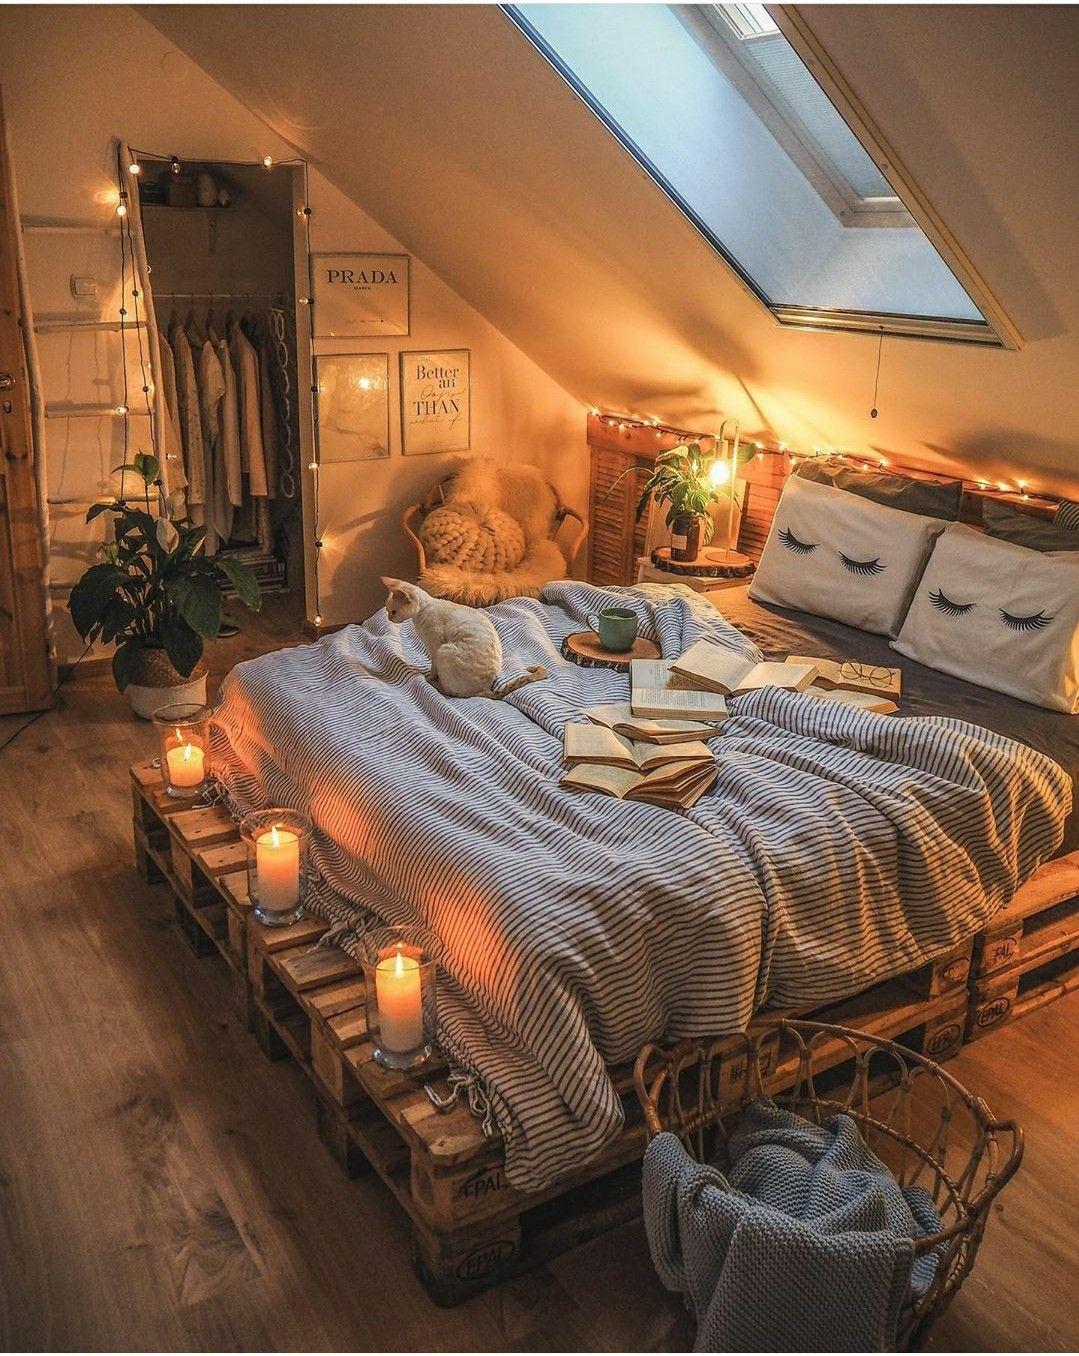 20 Cozy Bedroom Ideas For Fall Autumn Room Decor Warm Colour Palettes Earthy Tones Cosy Cozy Room Redecorate Bedroom Aesthetic Bedroom The cozy bedroom ideas